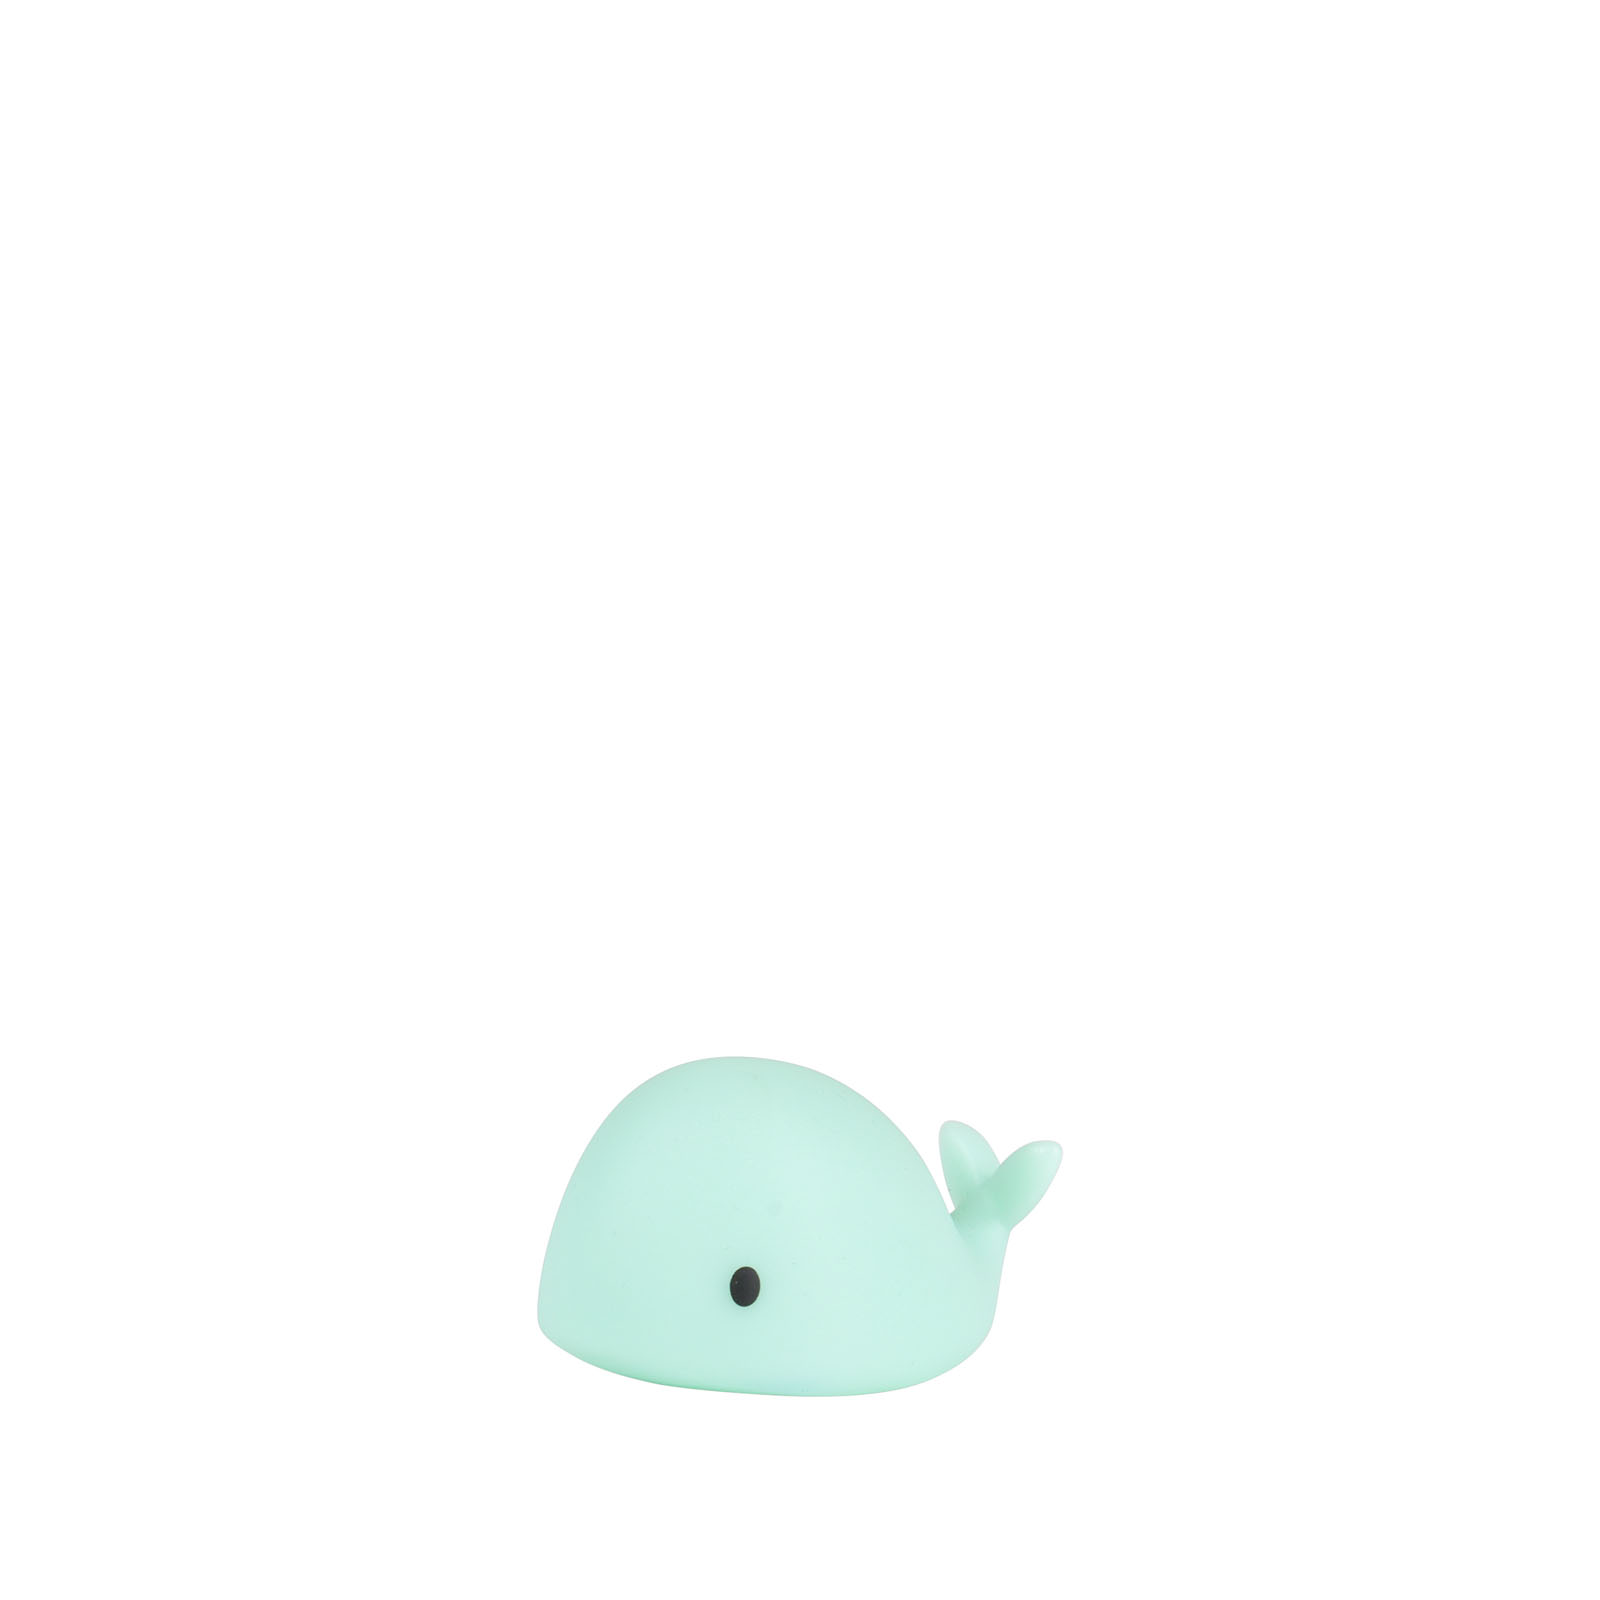 LED Lampe Nachtlicht Walfisch Moby Mini grün